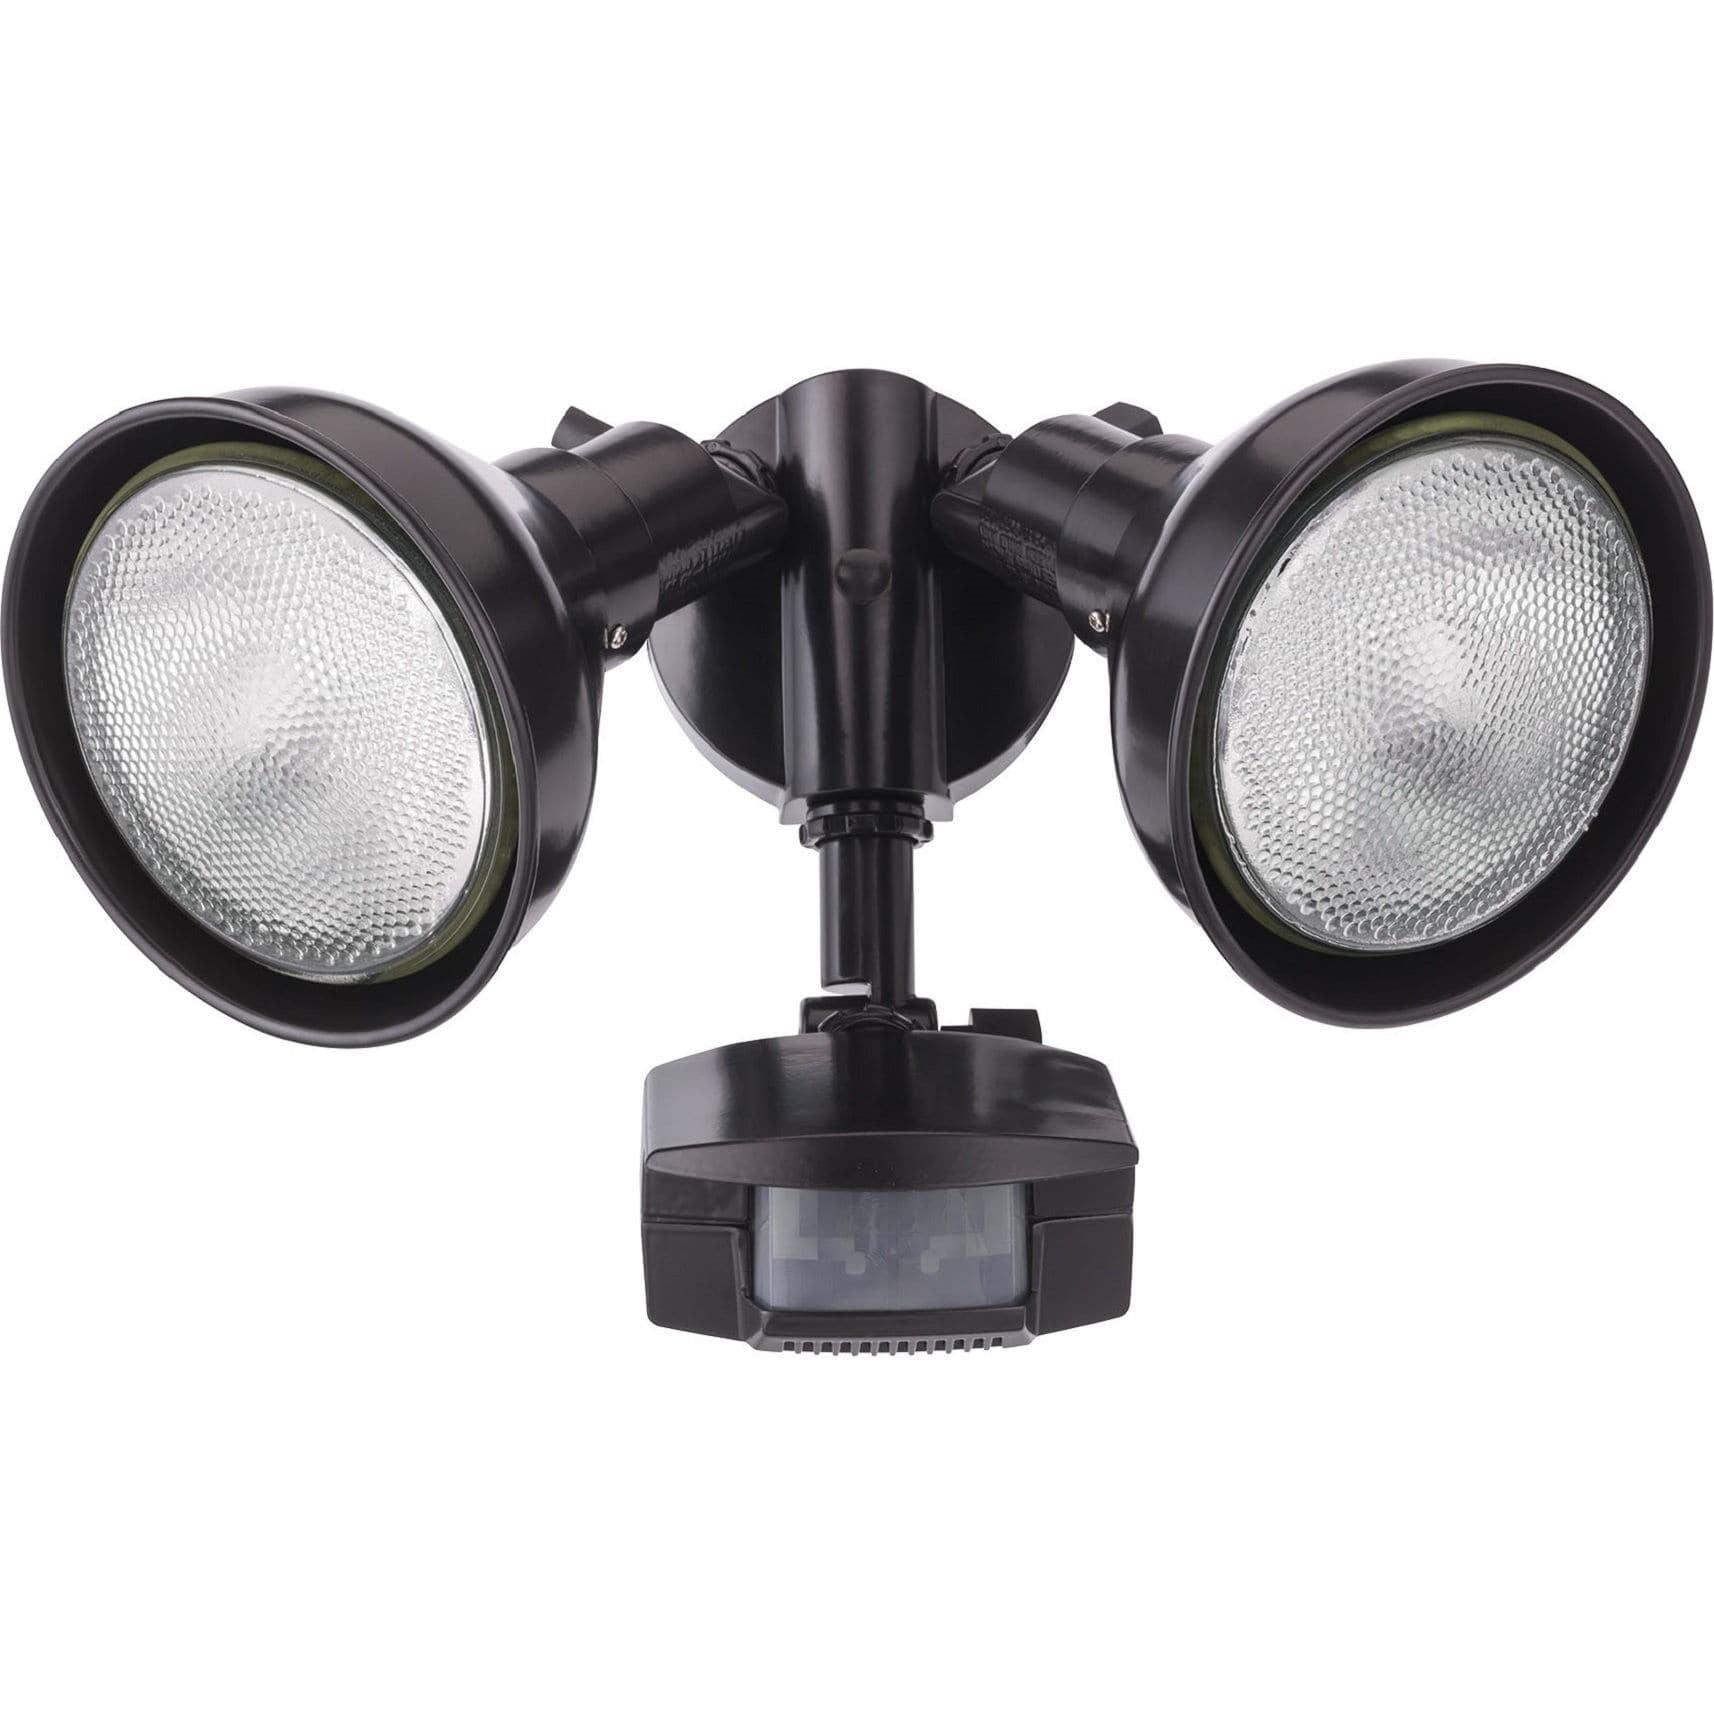 Lithonia Lighting  OMS 2000 PR2 120 DDB M4 150W Outdoor Black Bronze Par Holder with 200-degree Detection Motion Sensor